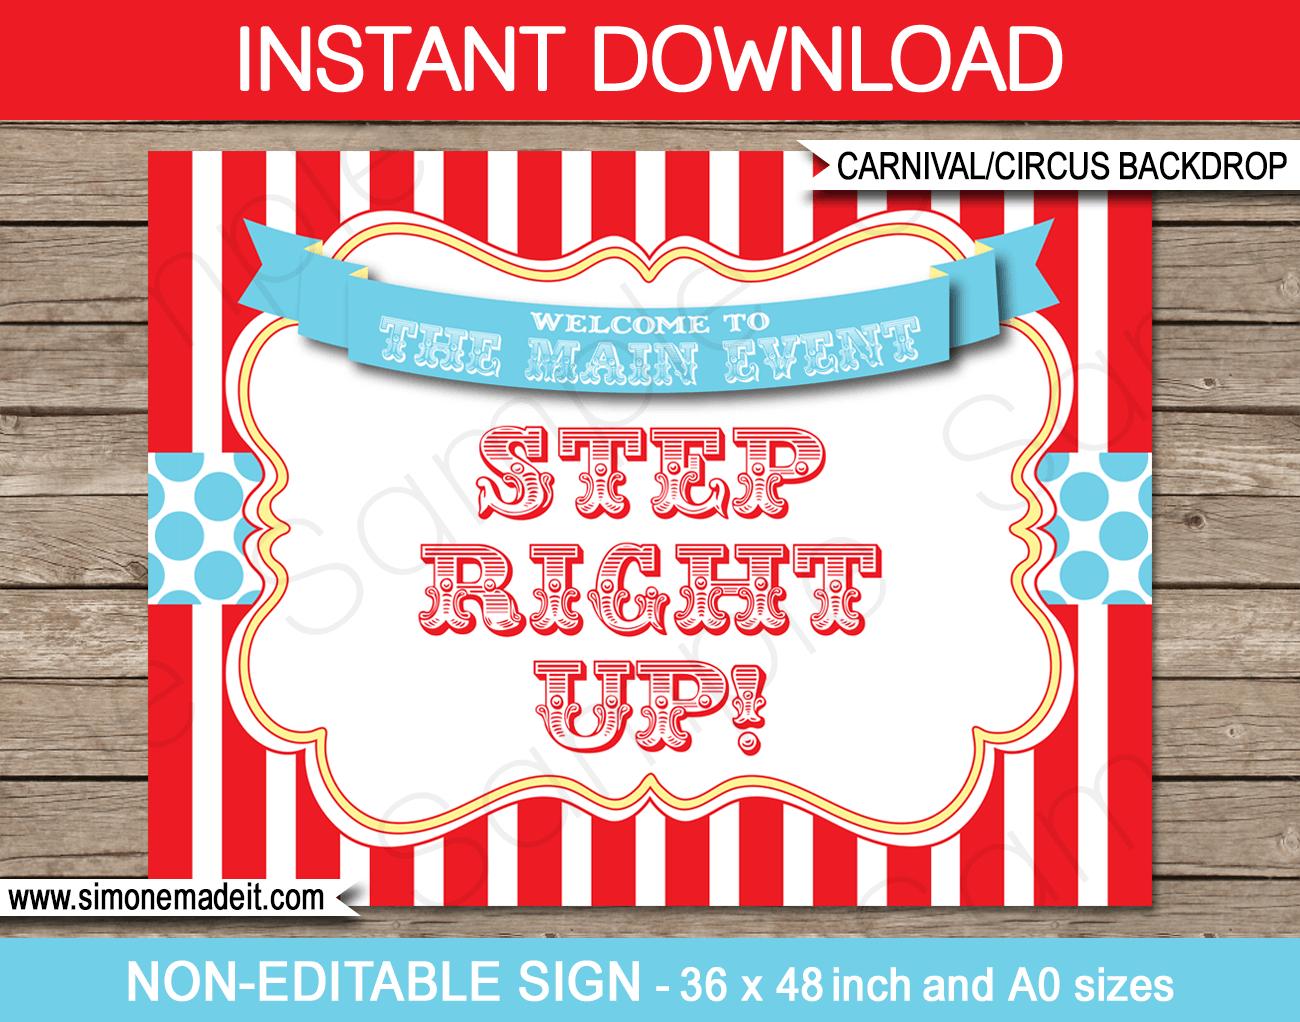 Printable Circus Backdrop Sign | Carnival Party Decorations - Free Printable Carnival Decorations